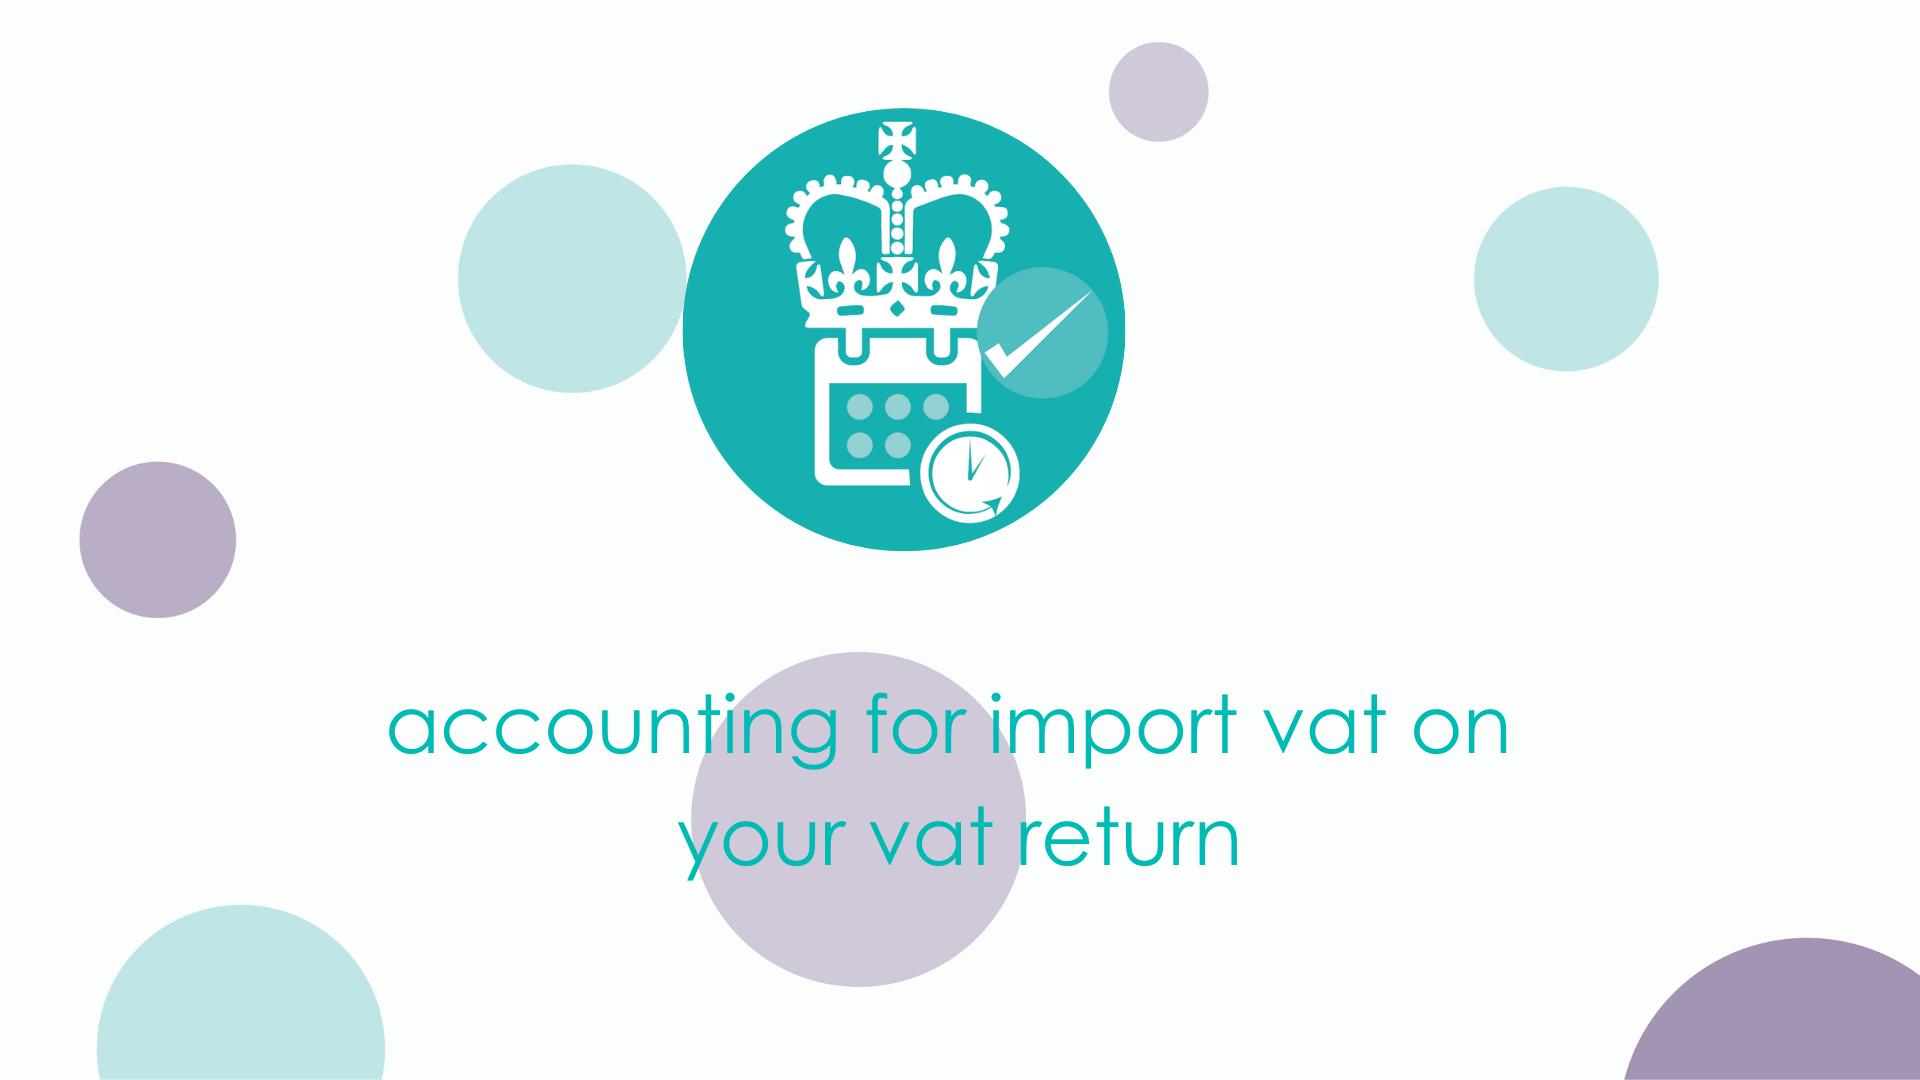 accounting for import vat on your vat return